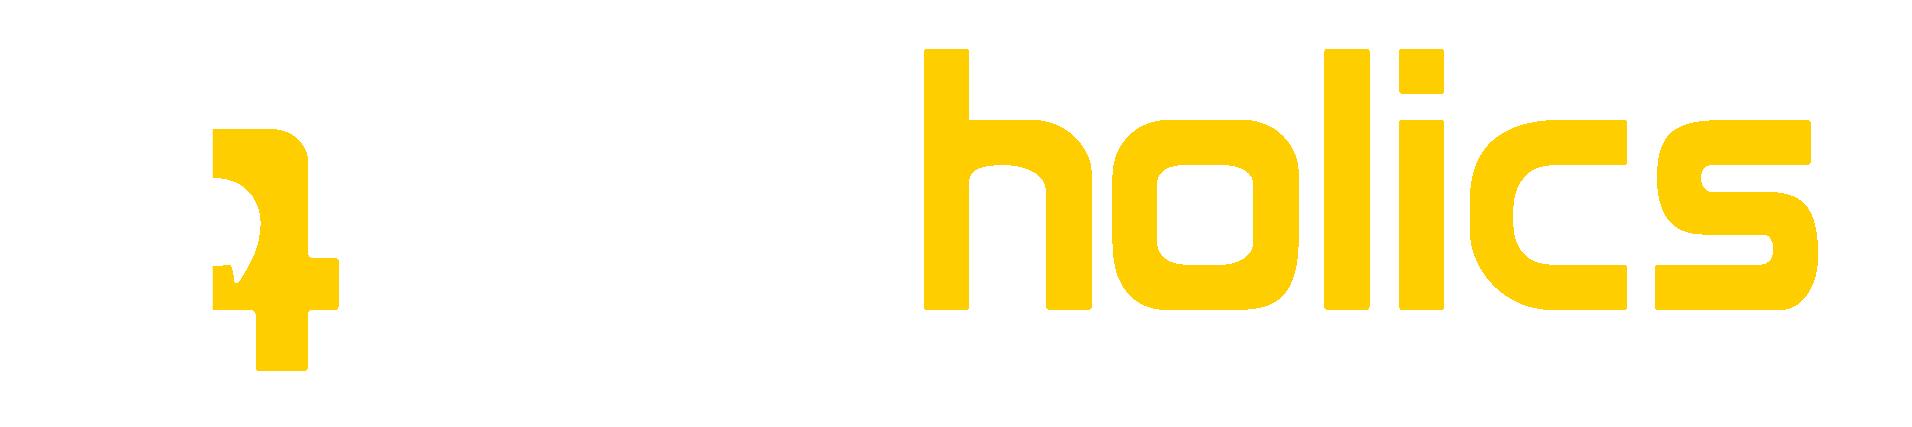 Techolics